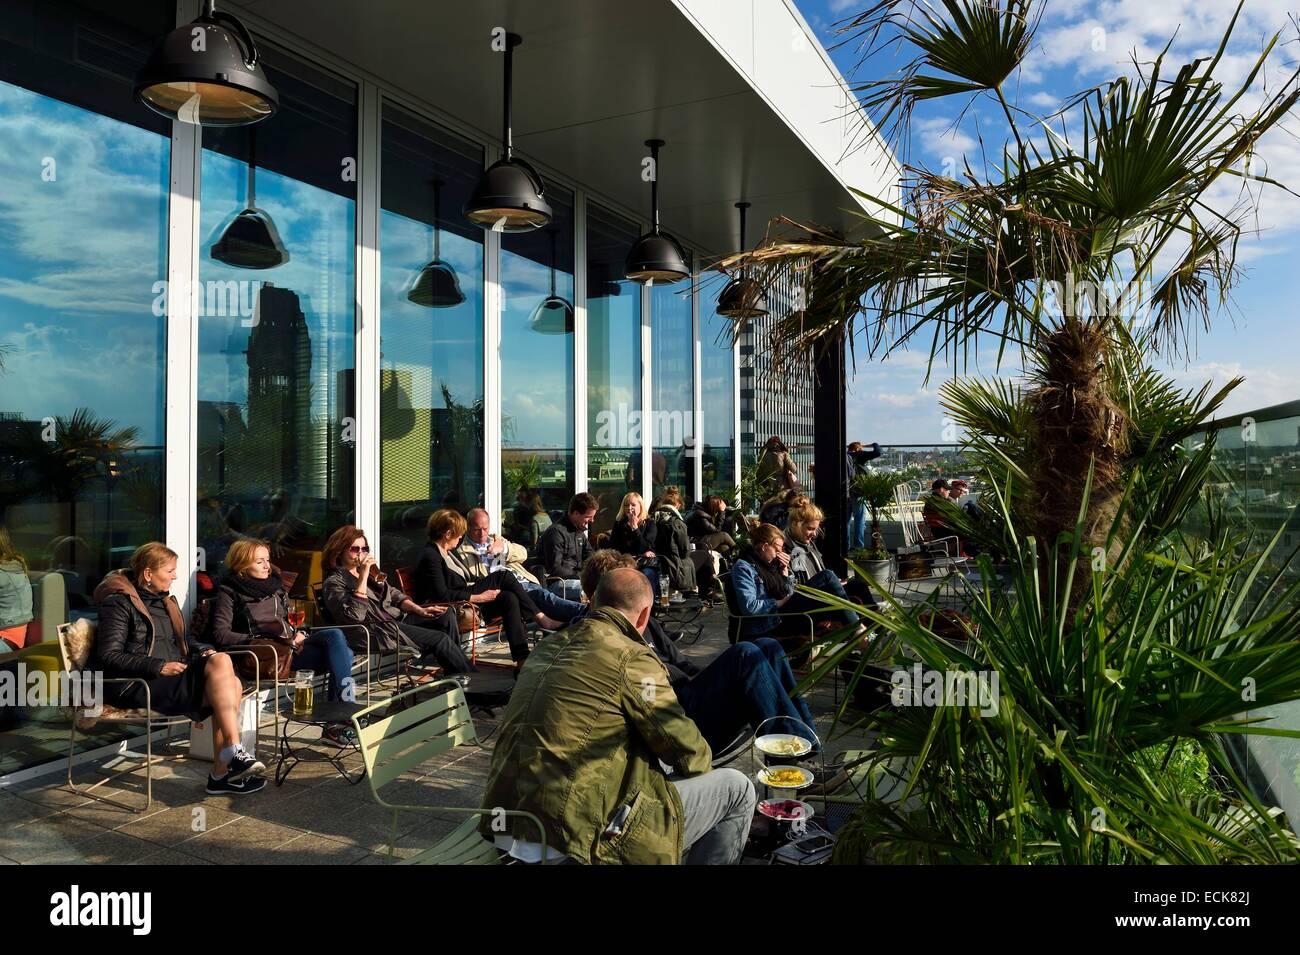 Germany, Berlin, Tiergarten district, Neni Berlin restaurant and monkey bar in the Bikini building - Stock Image